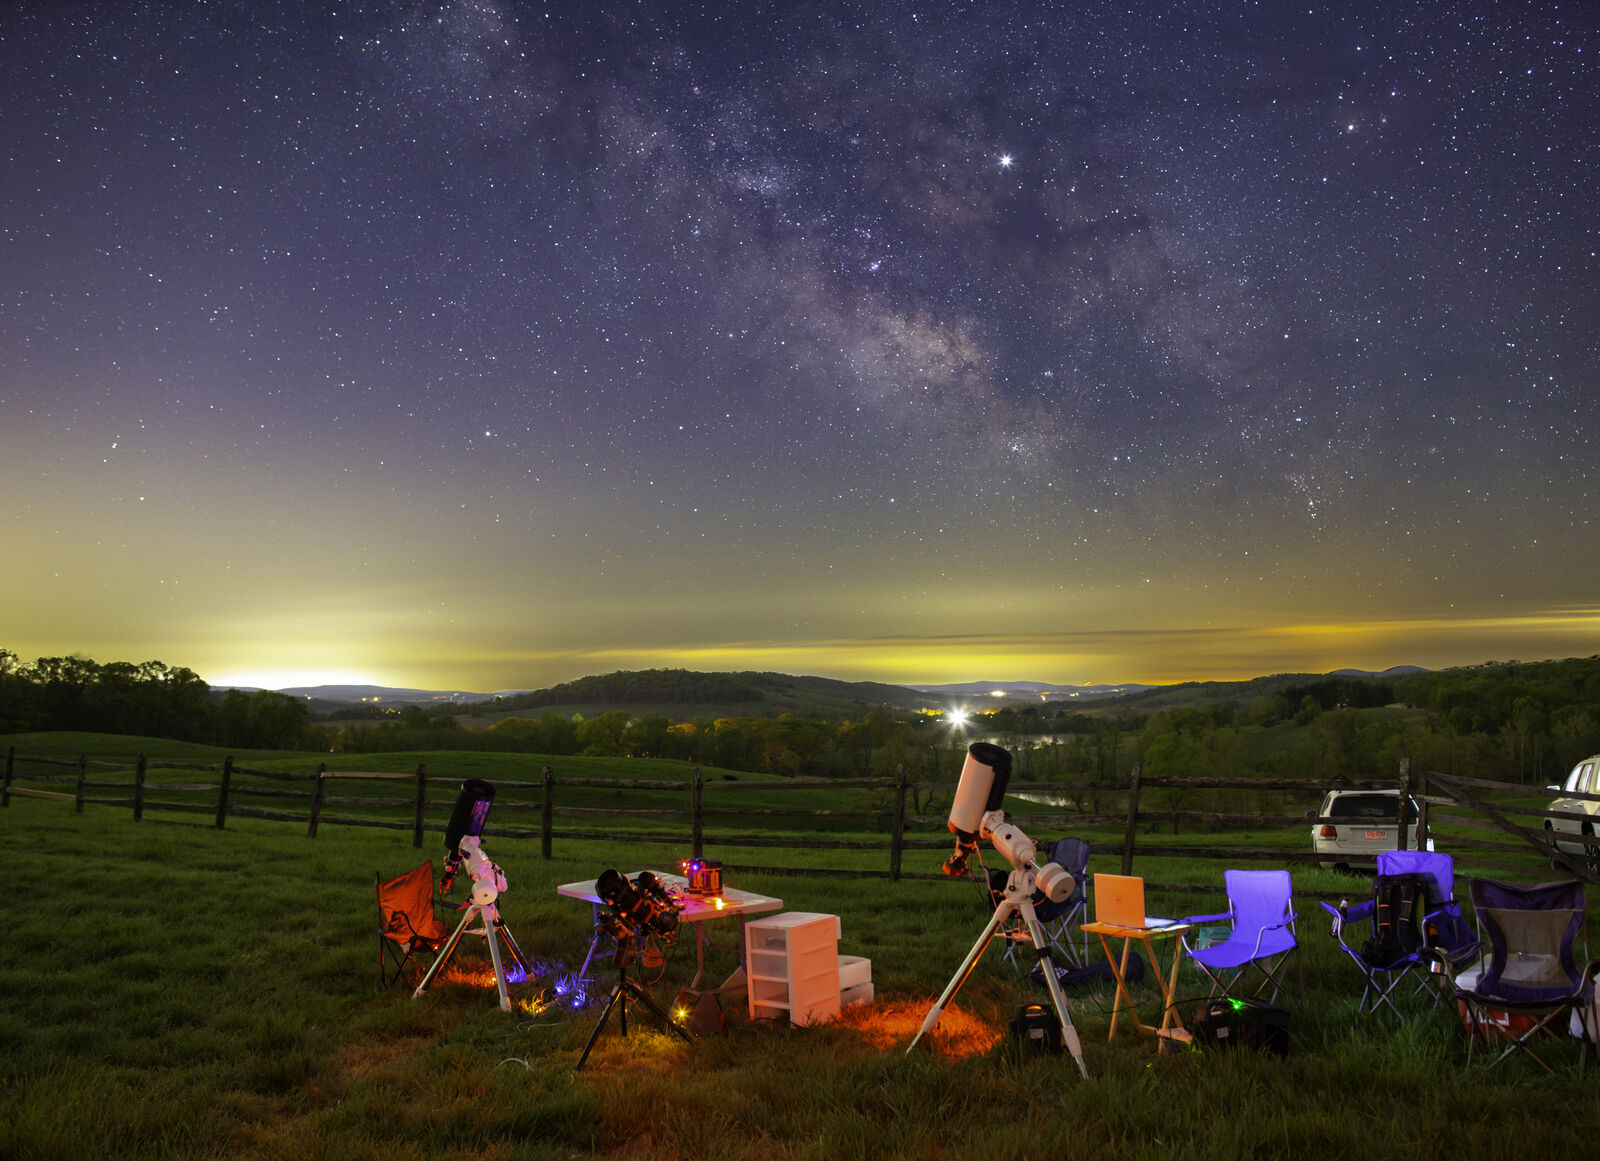 Gear and Milky Way at Sky Meadows State Park, NOVA